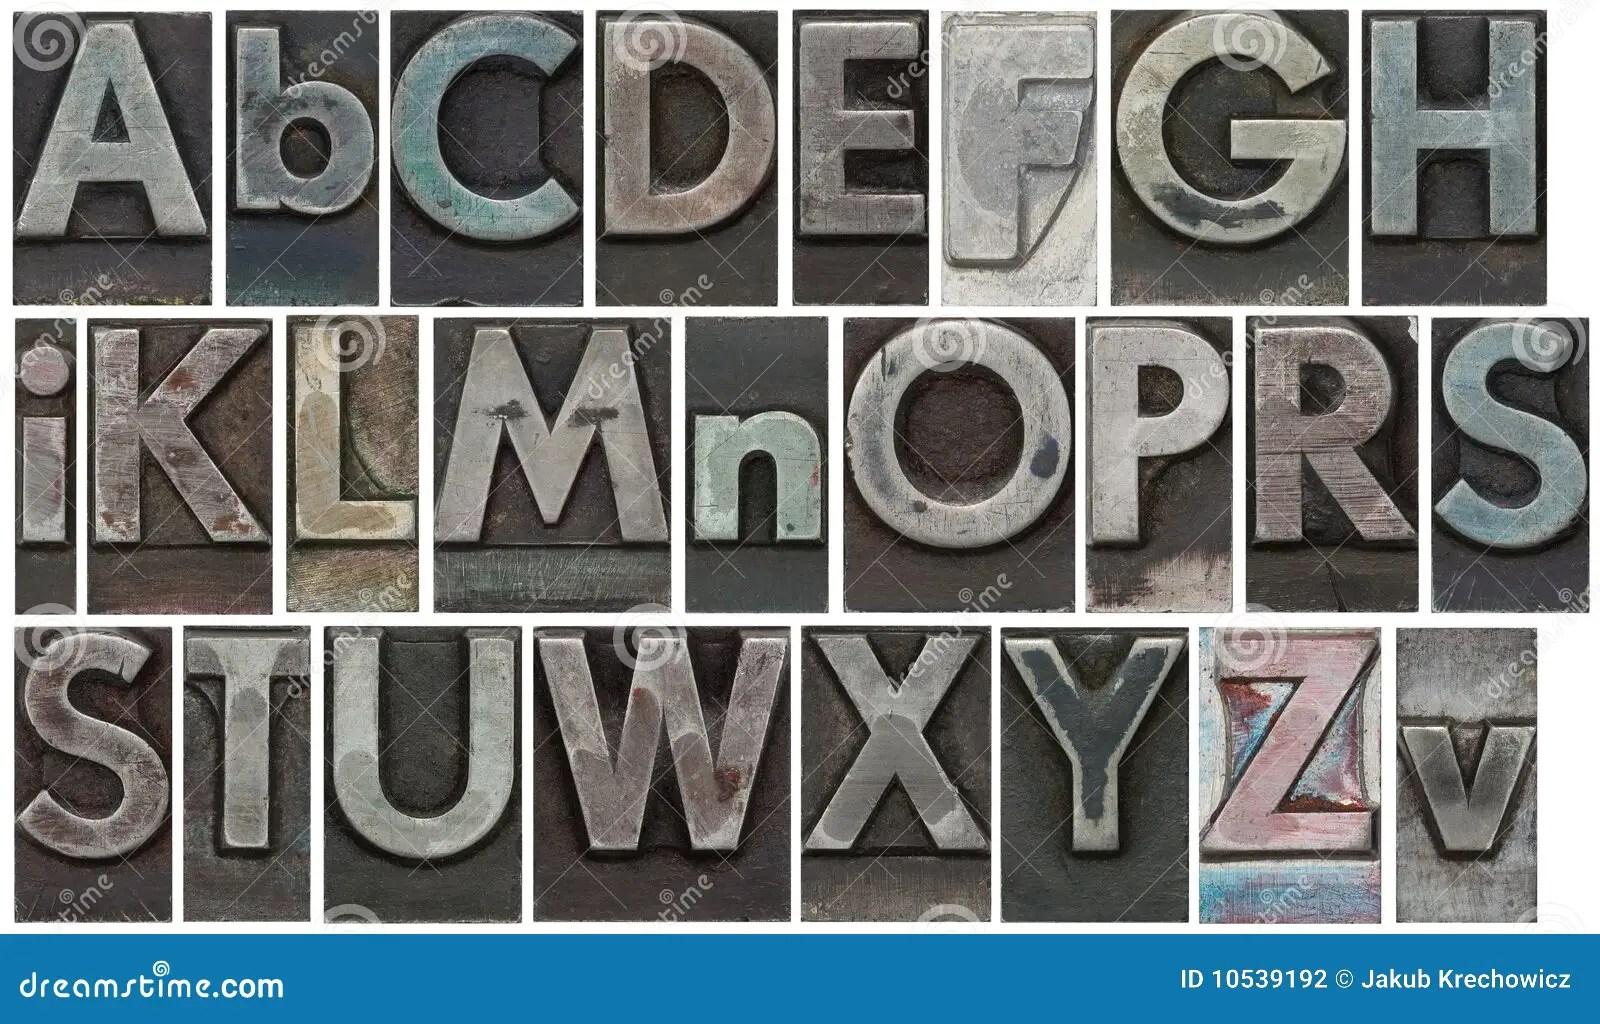 Black And White Alphabet Blocks